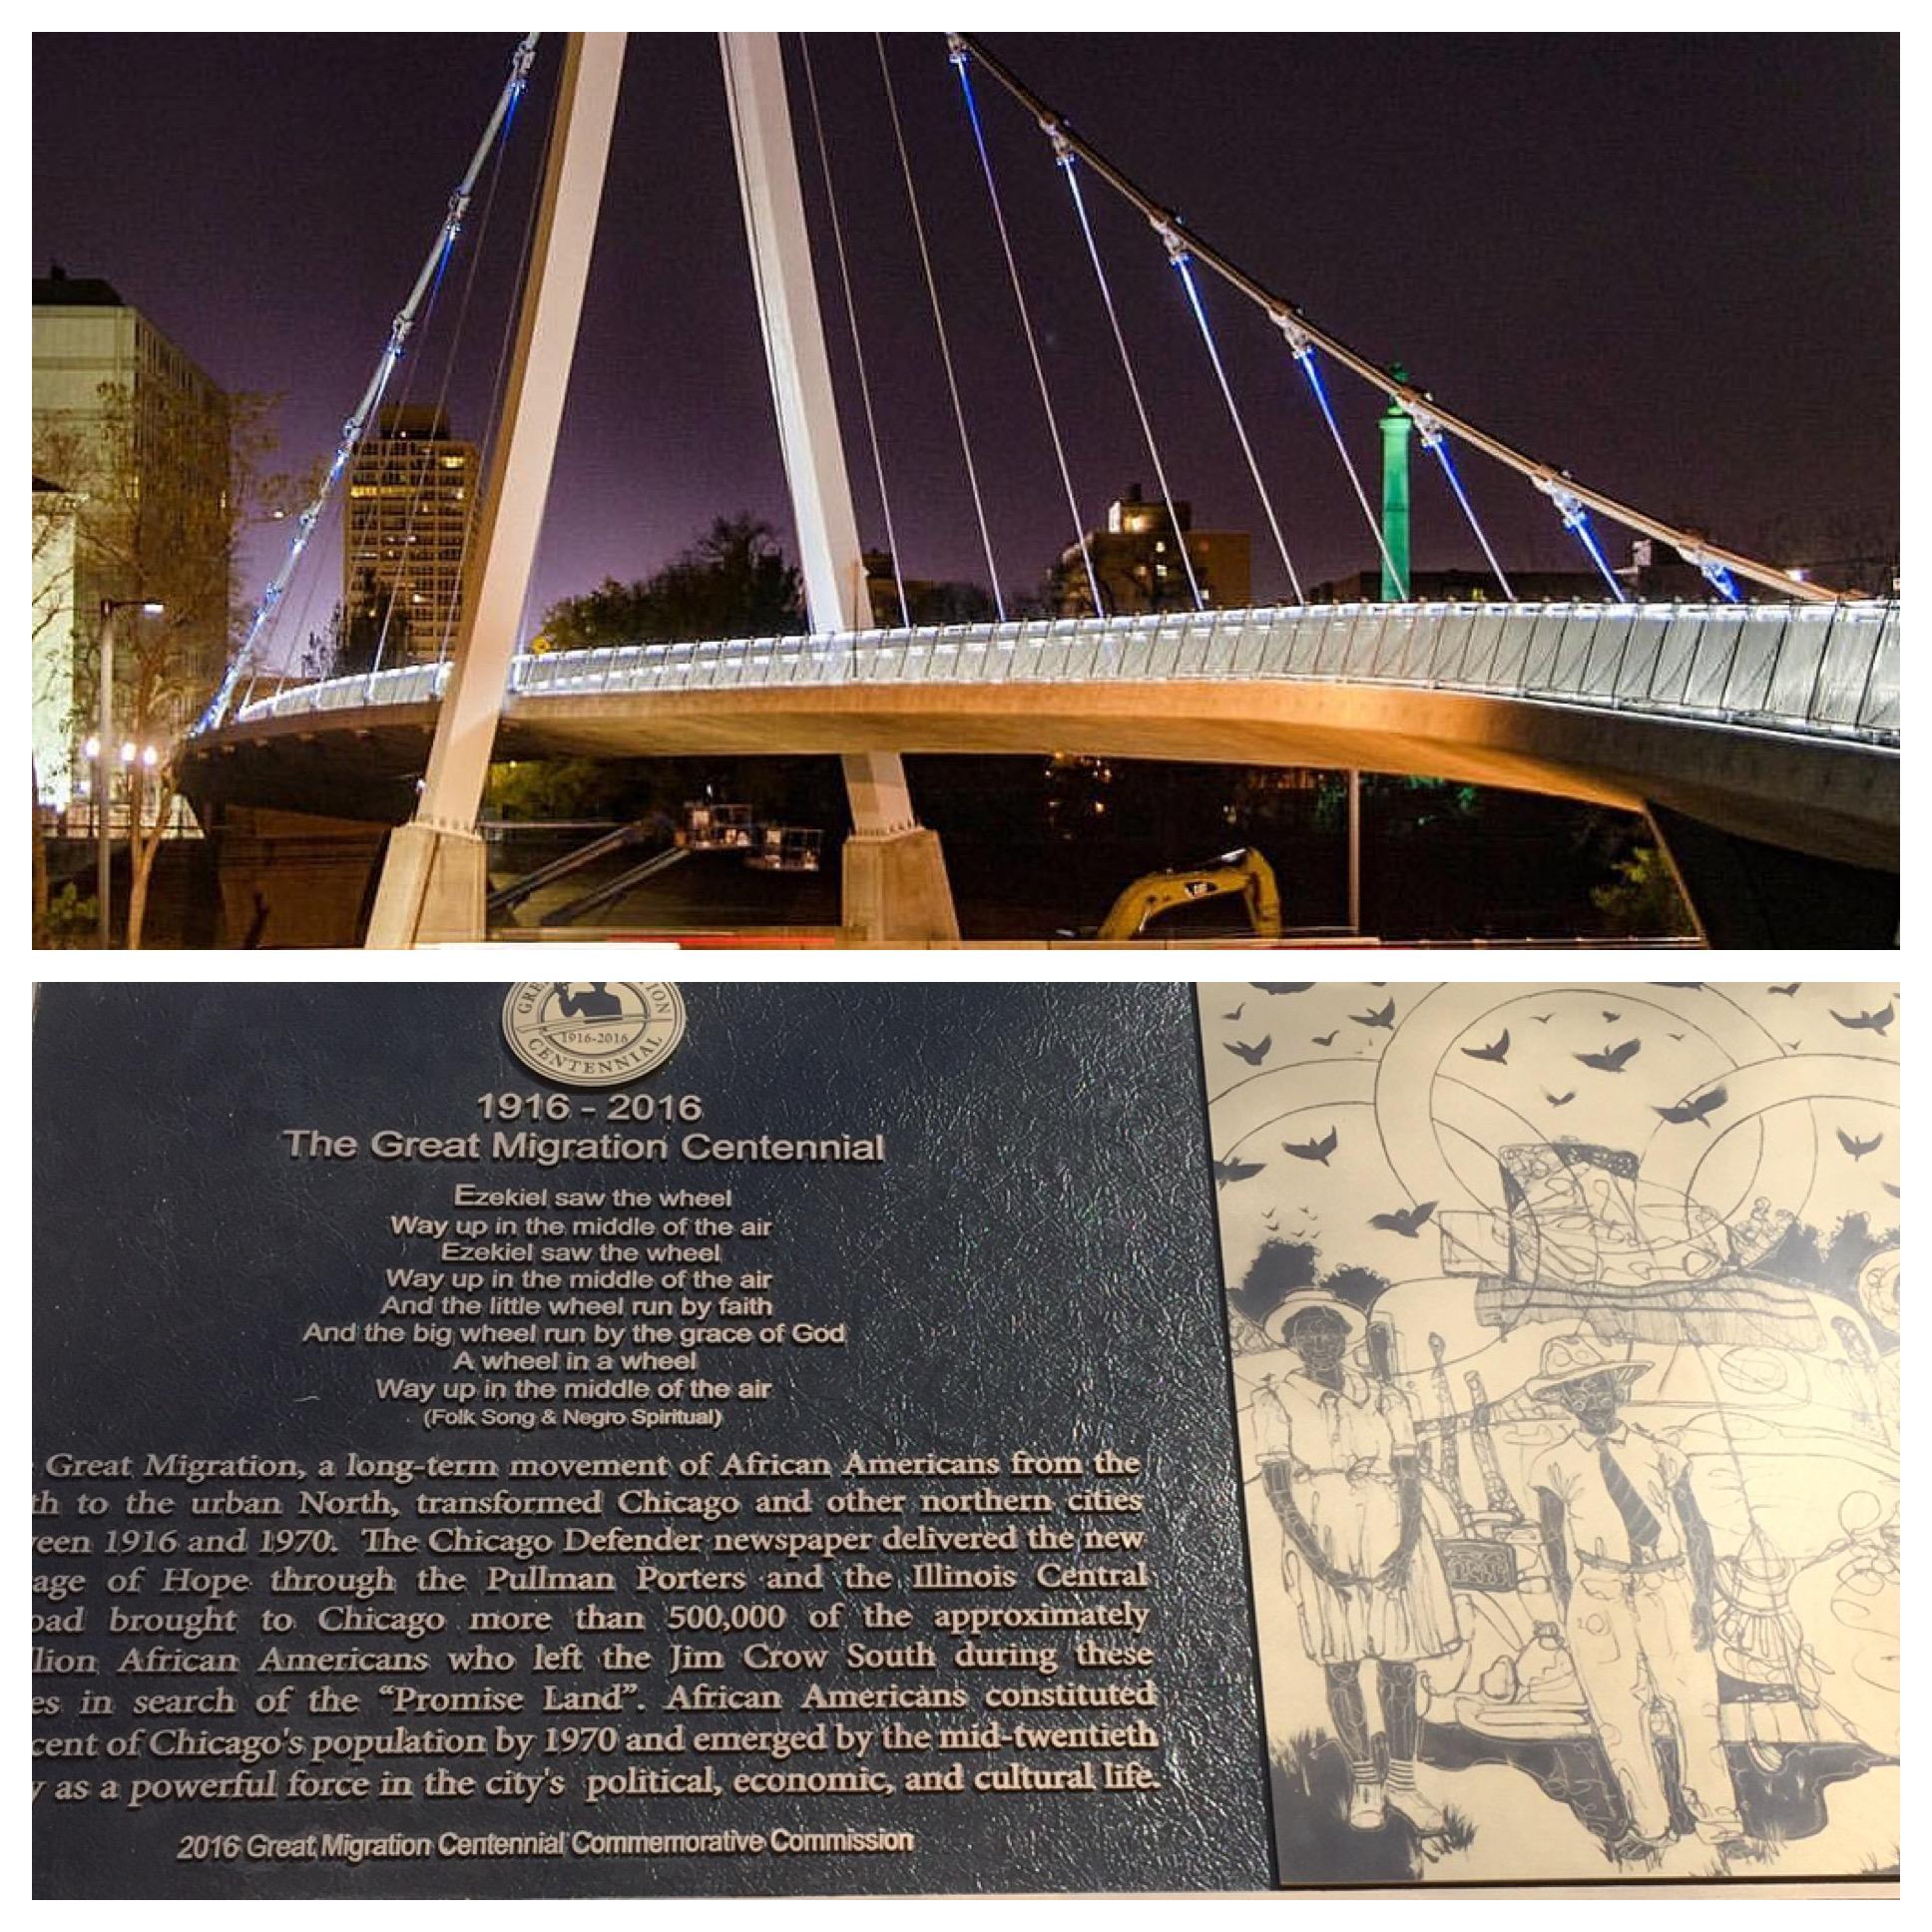 35th St. Bridge